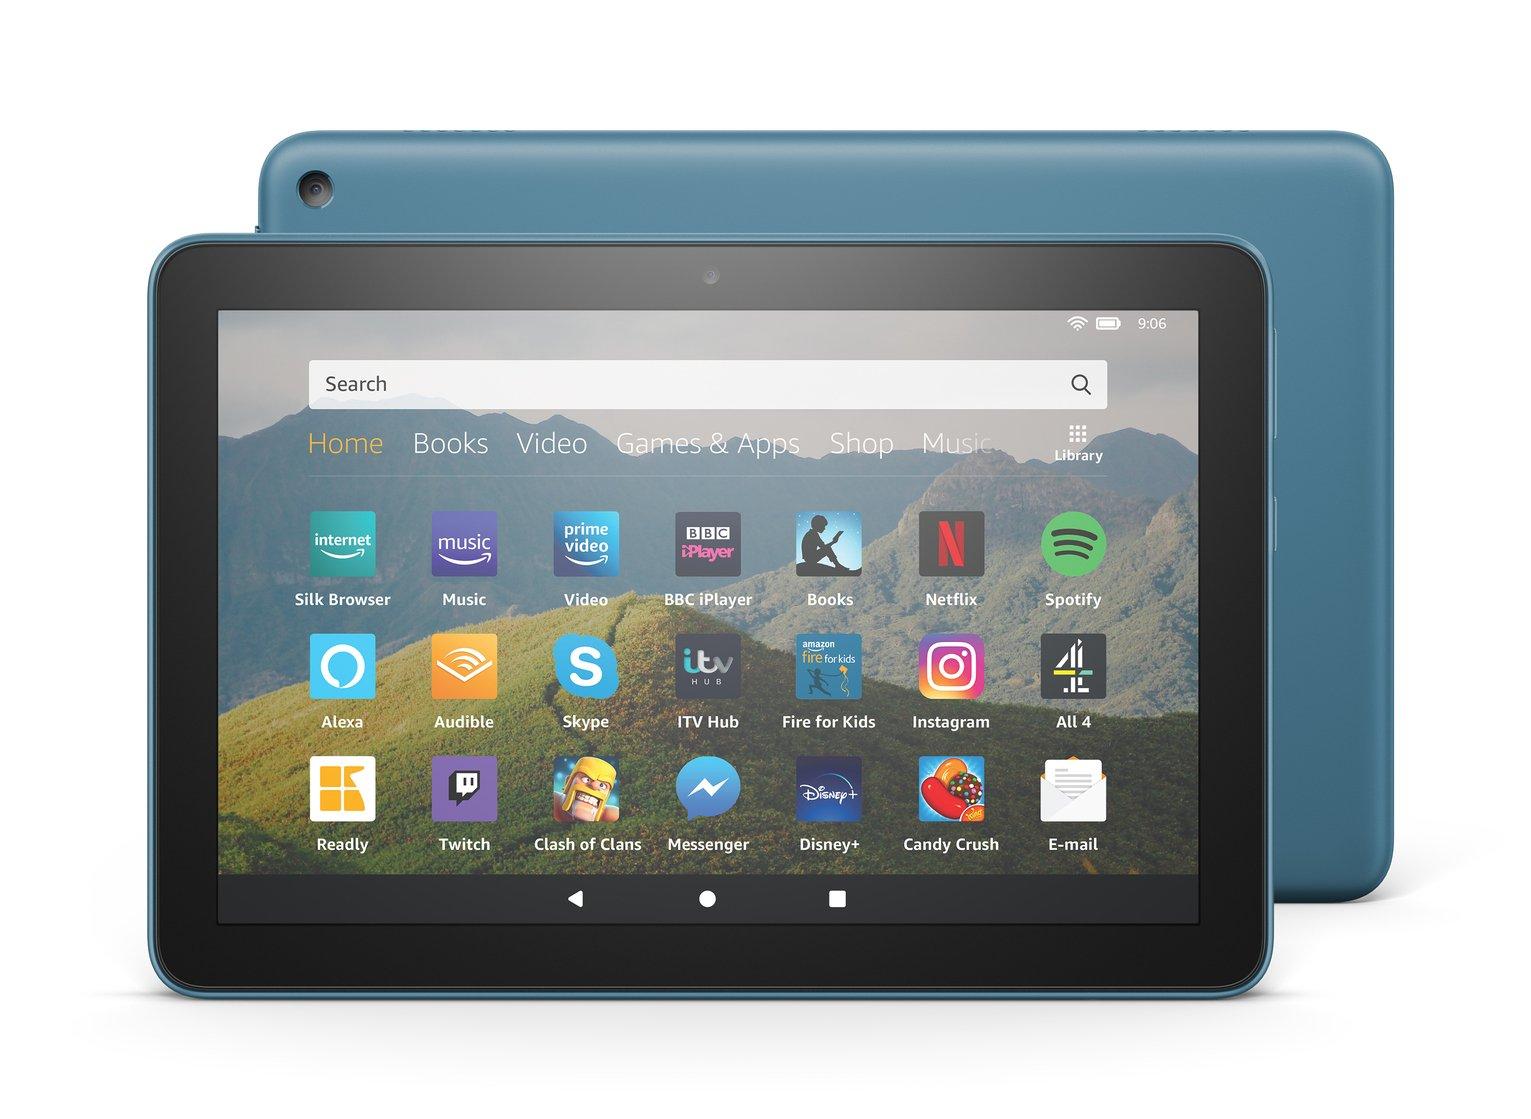 Amazon Fire HD 8 Inch 32GB Tablet - Twilight Blue